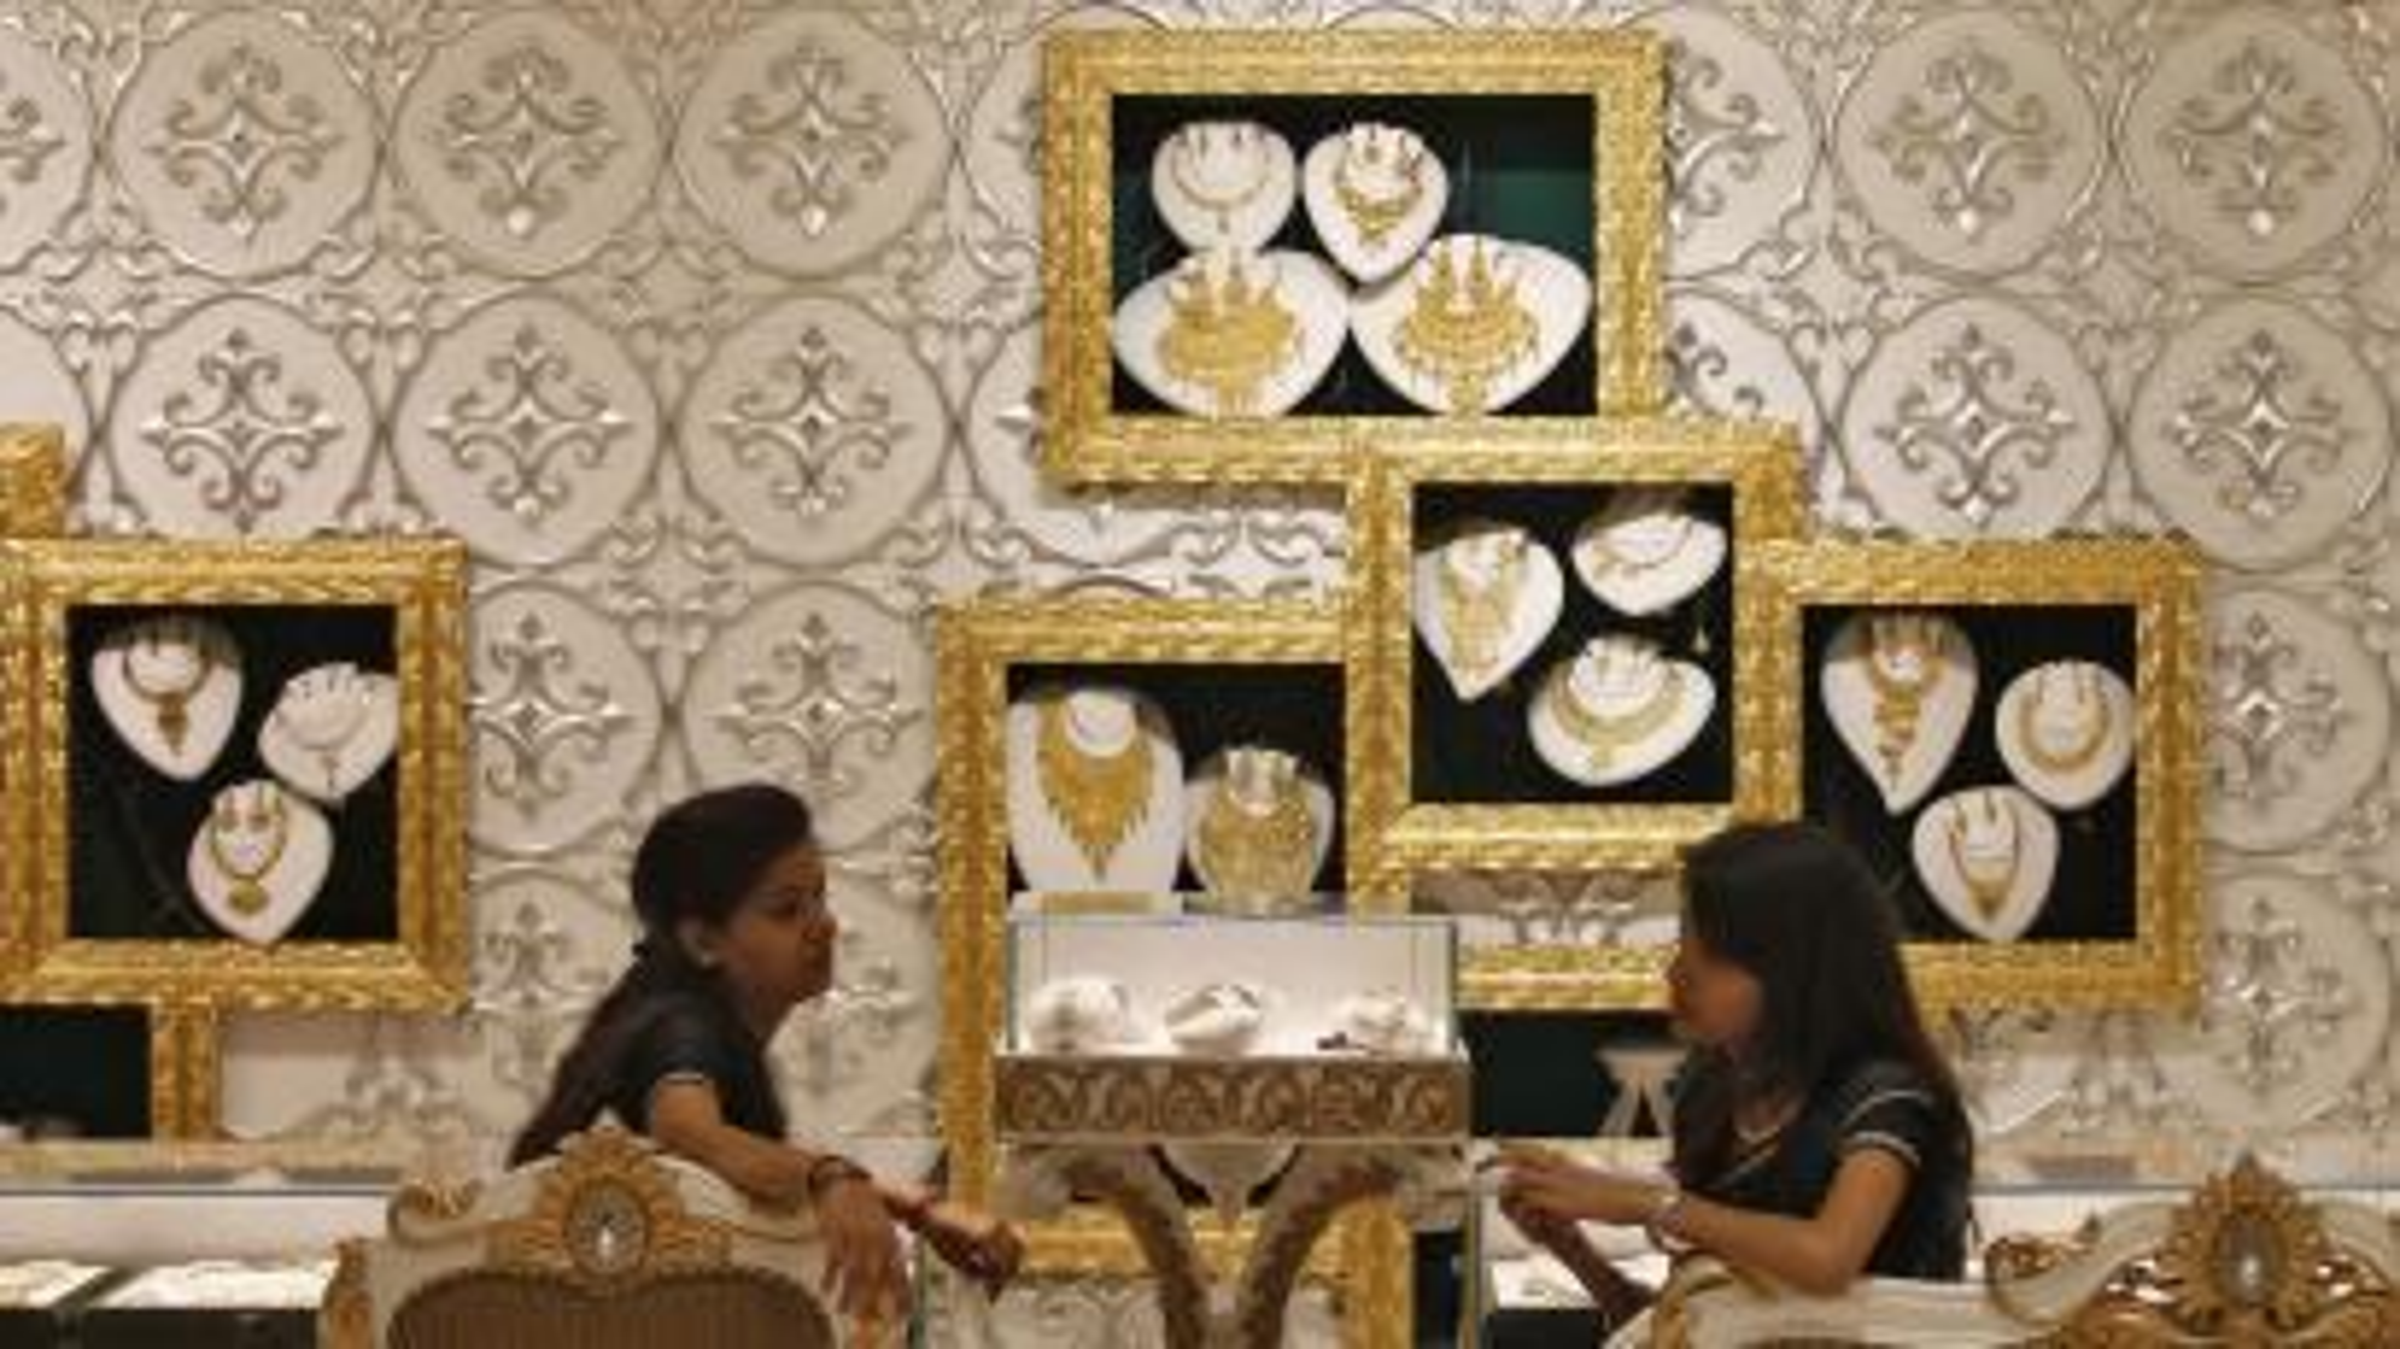 india-gold-shopping